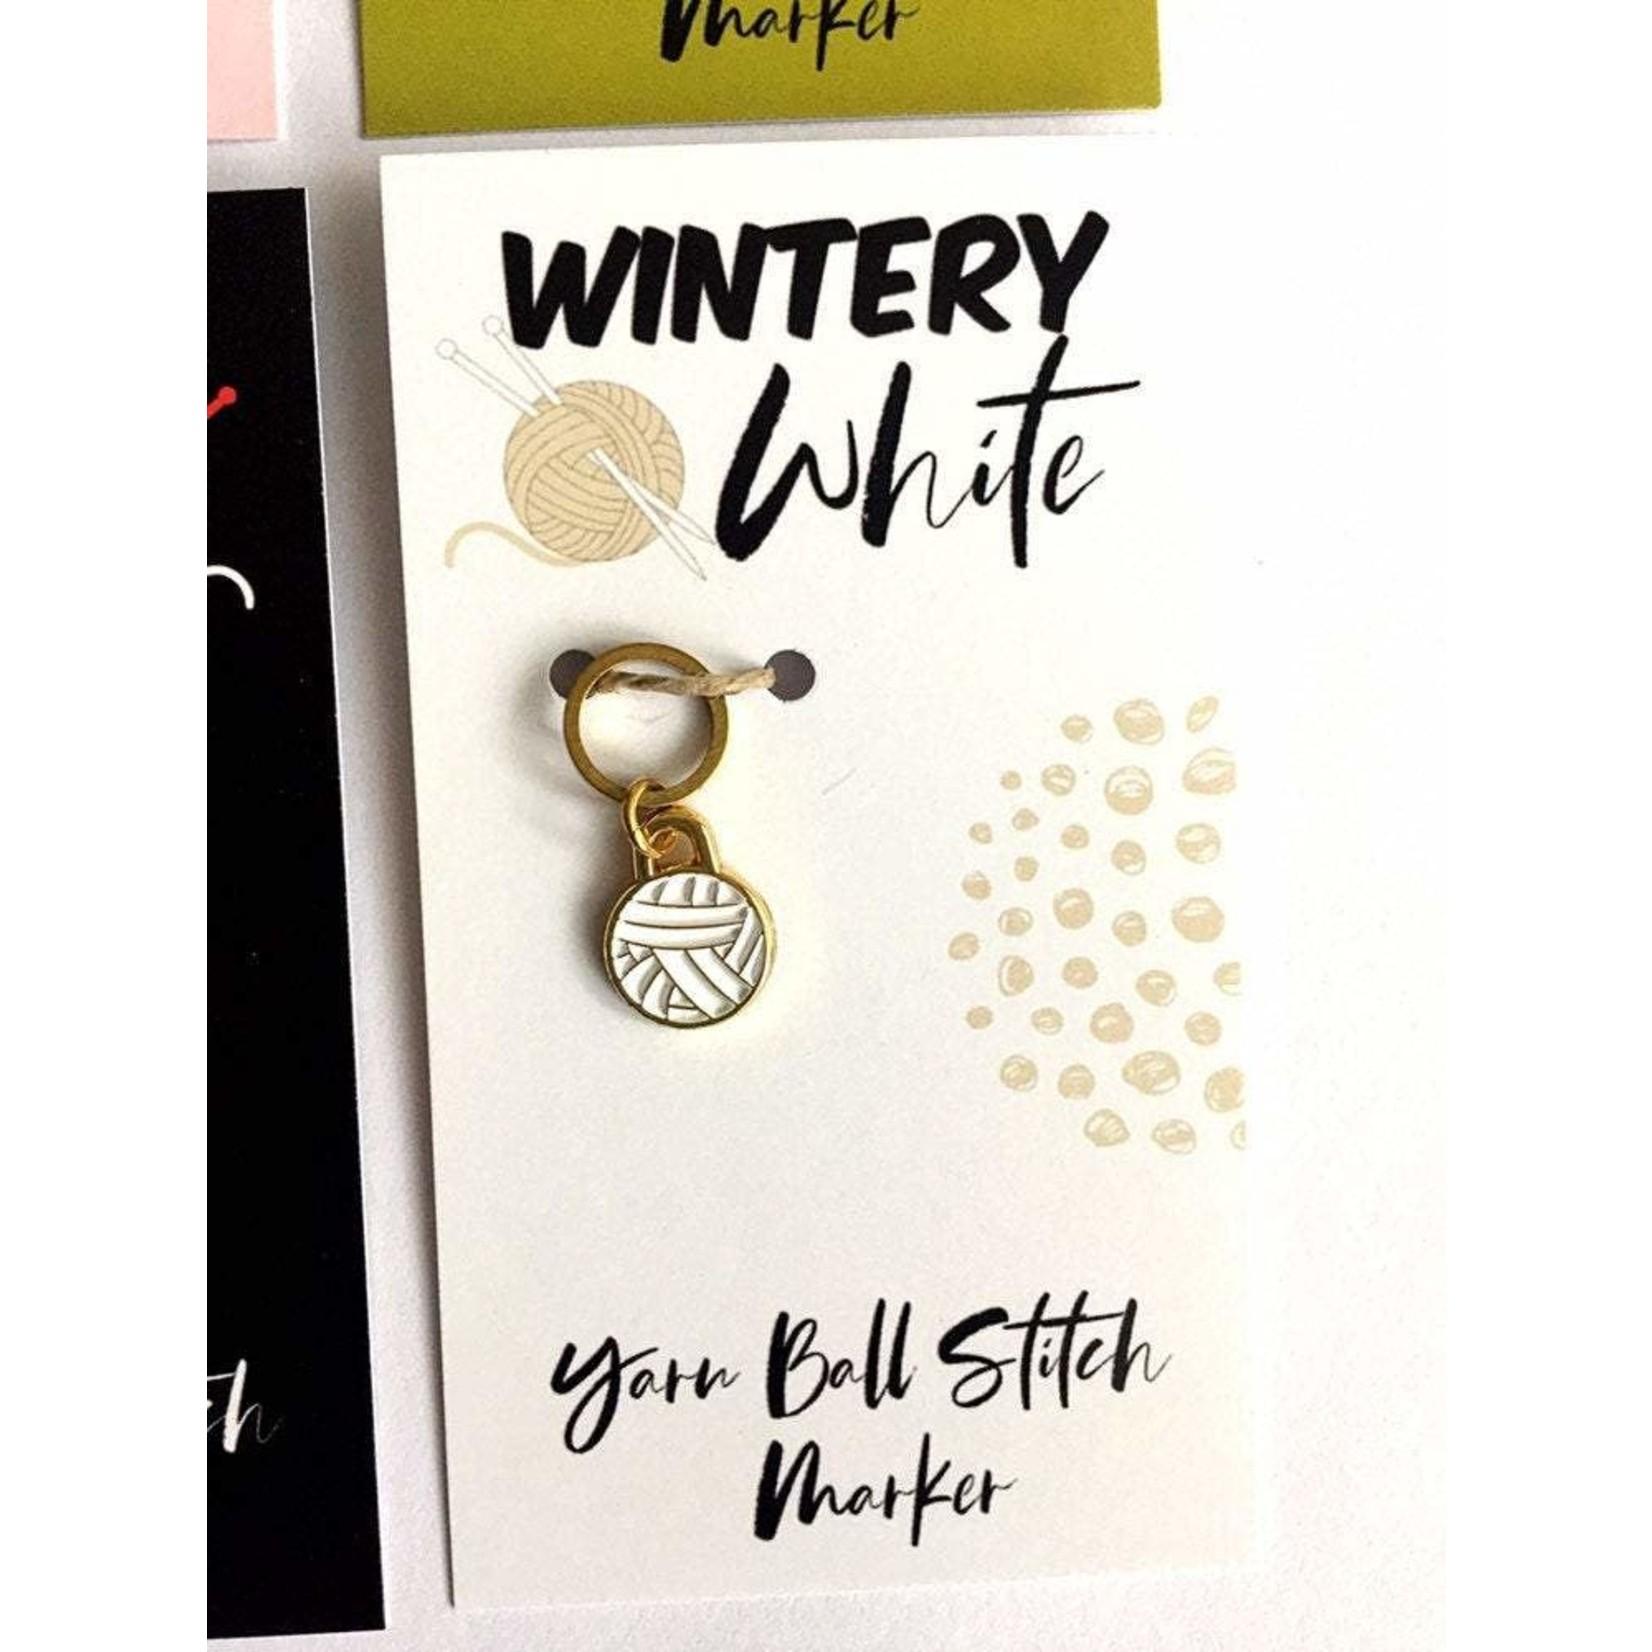 Firefly Notes Yarn Ball Stitch Marker